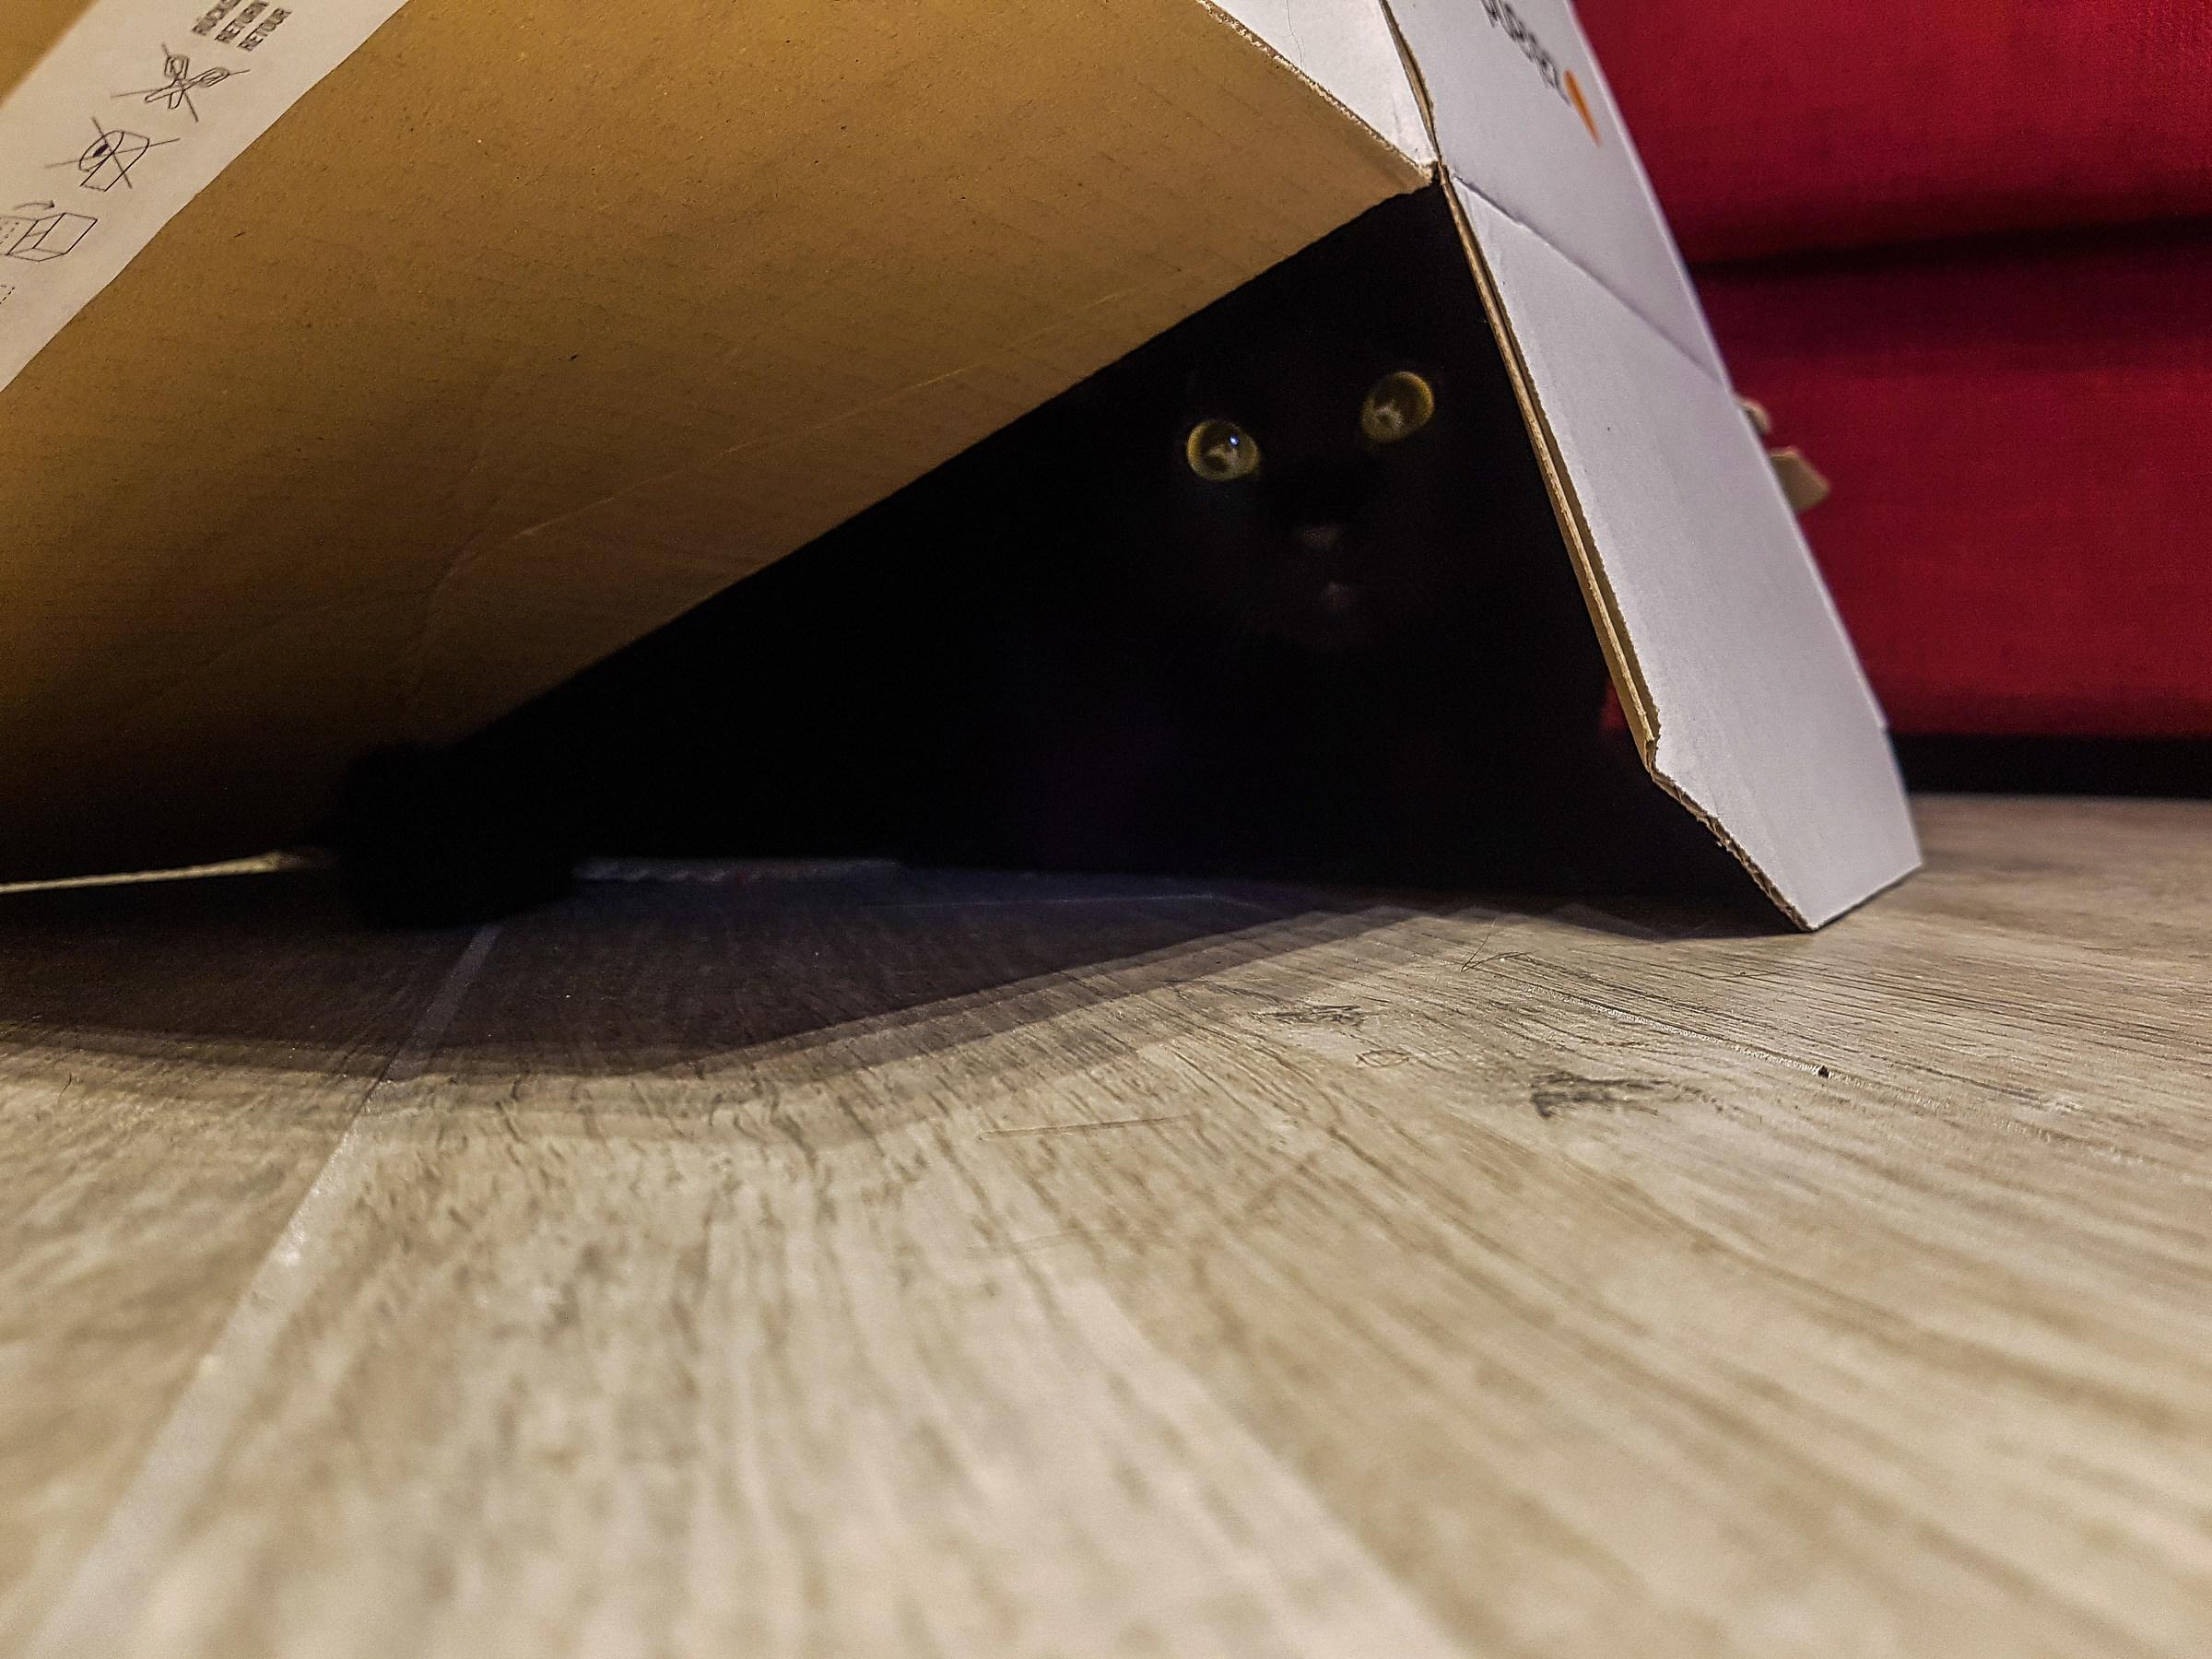 Nala hidden...